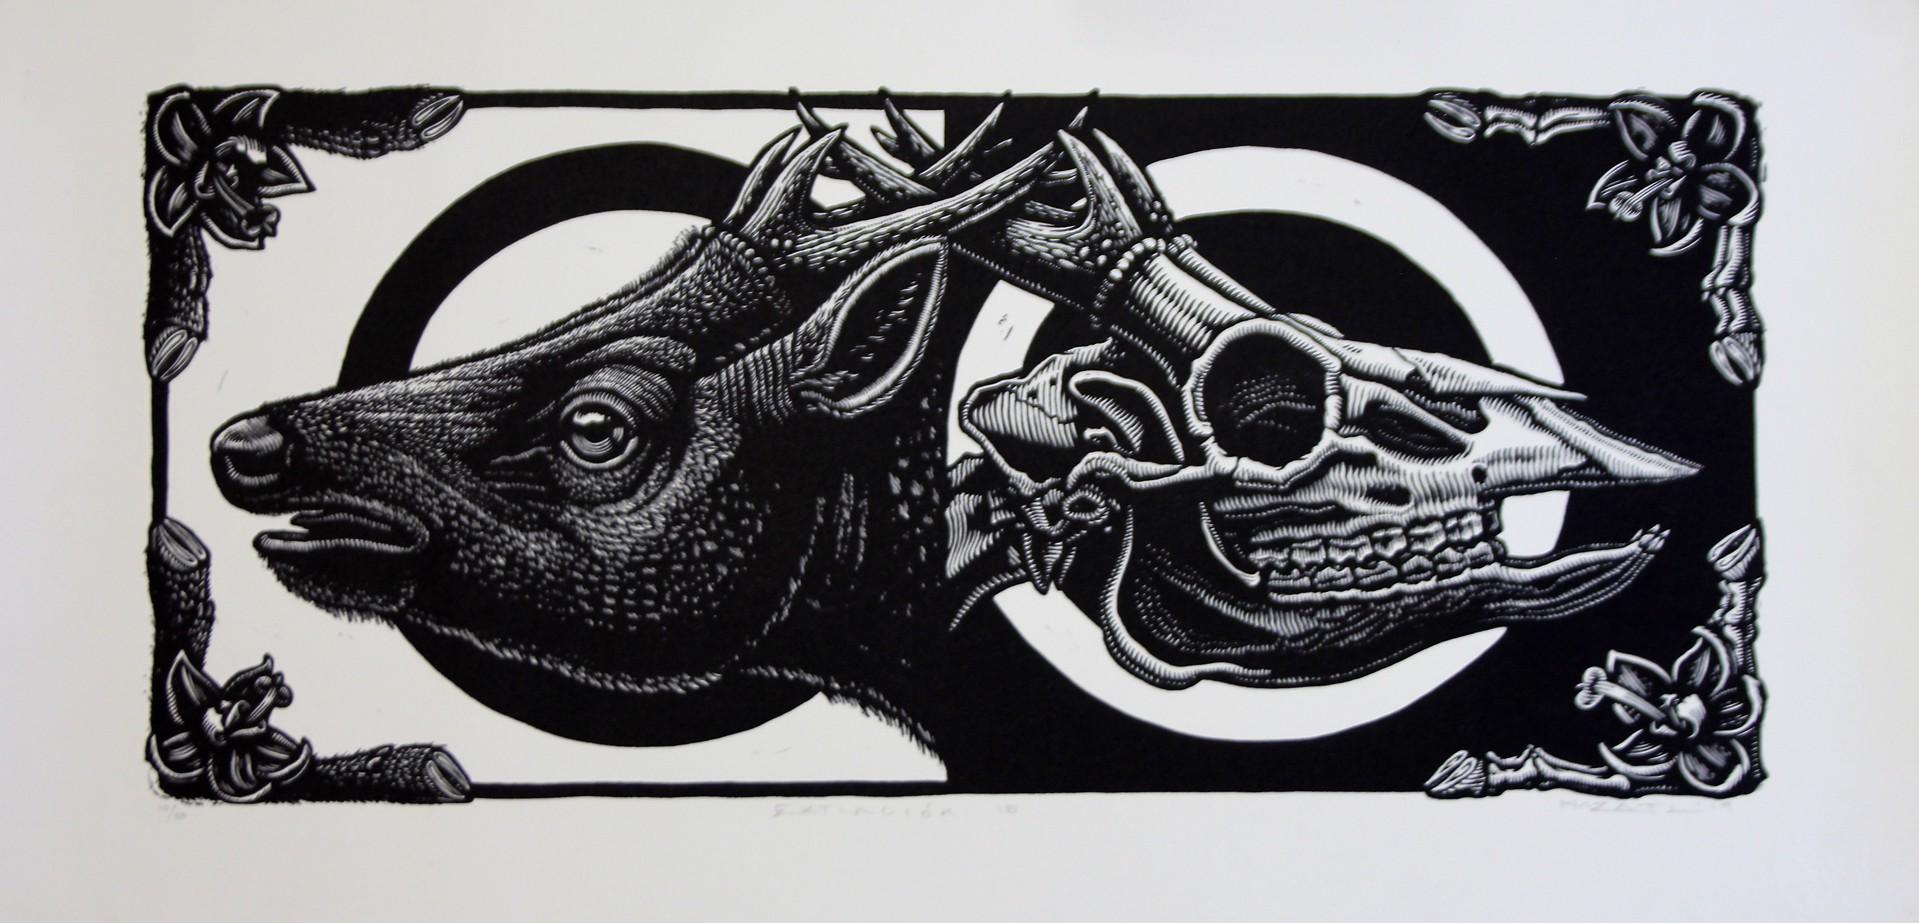 Extincion XV (Visayan Spotted Deer) by Mazatli